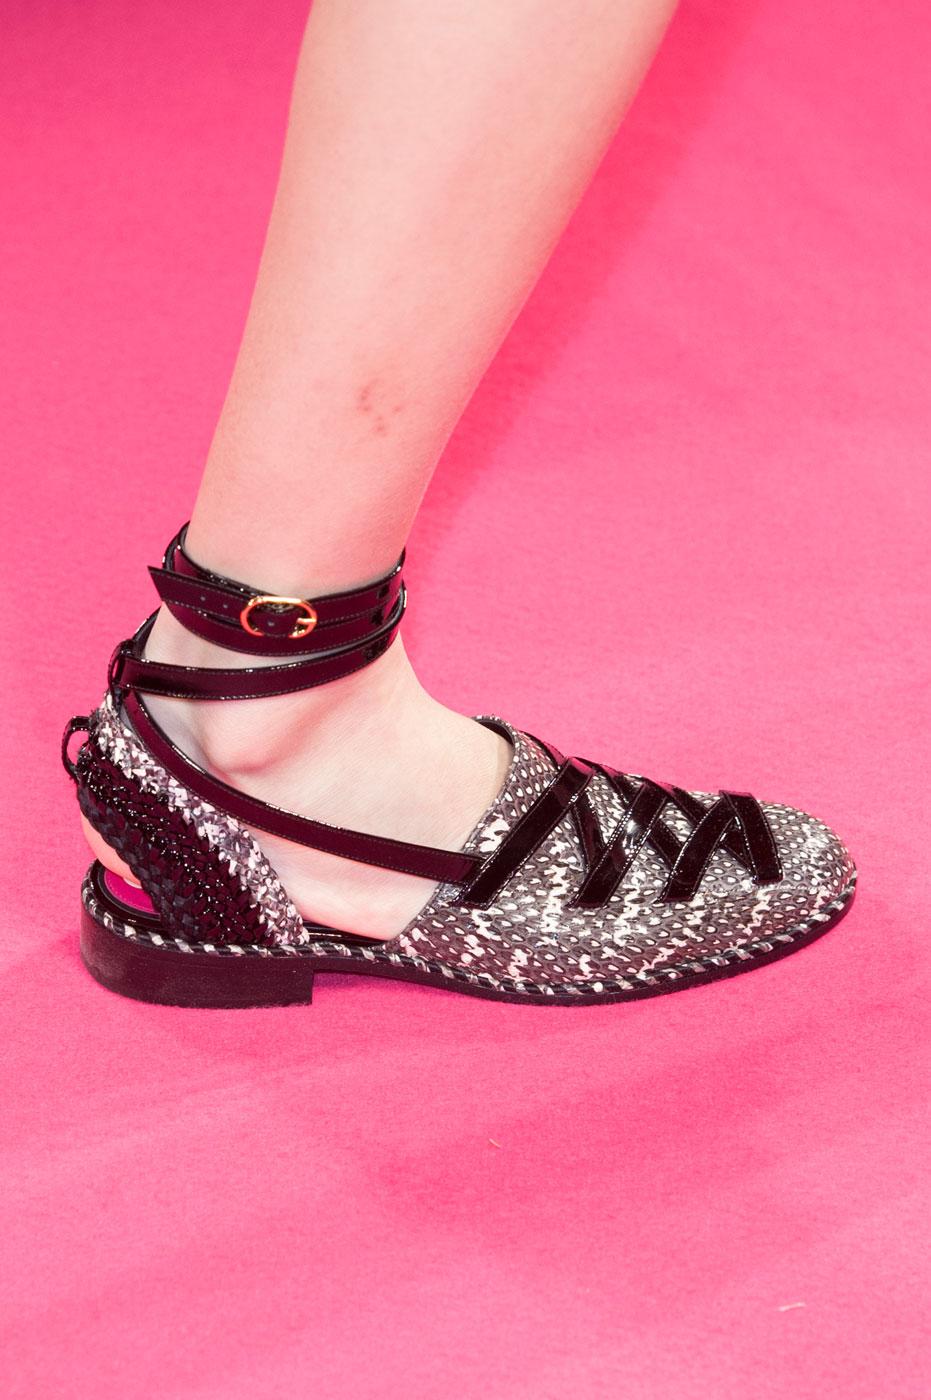 Schiaparelli-fashion-runway-show-close-ups-haute-couture-paris-spring-summer-2015-the-impression-08